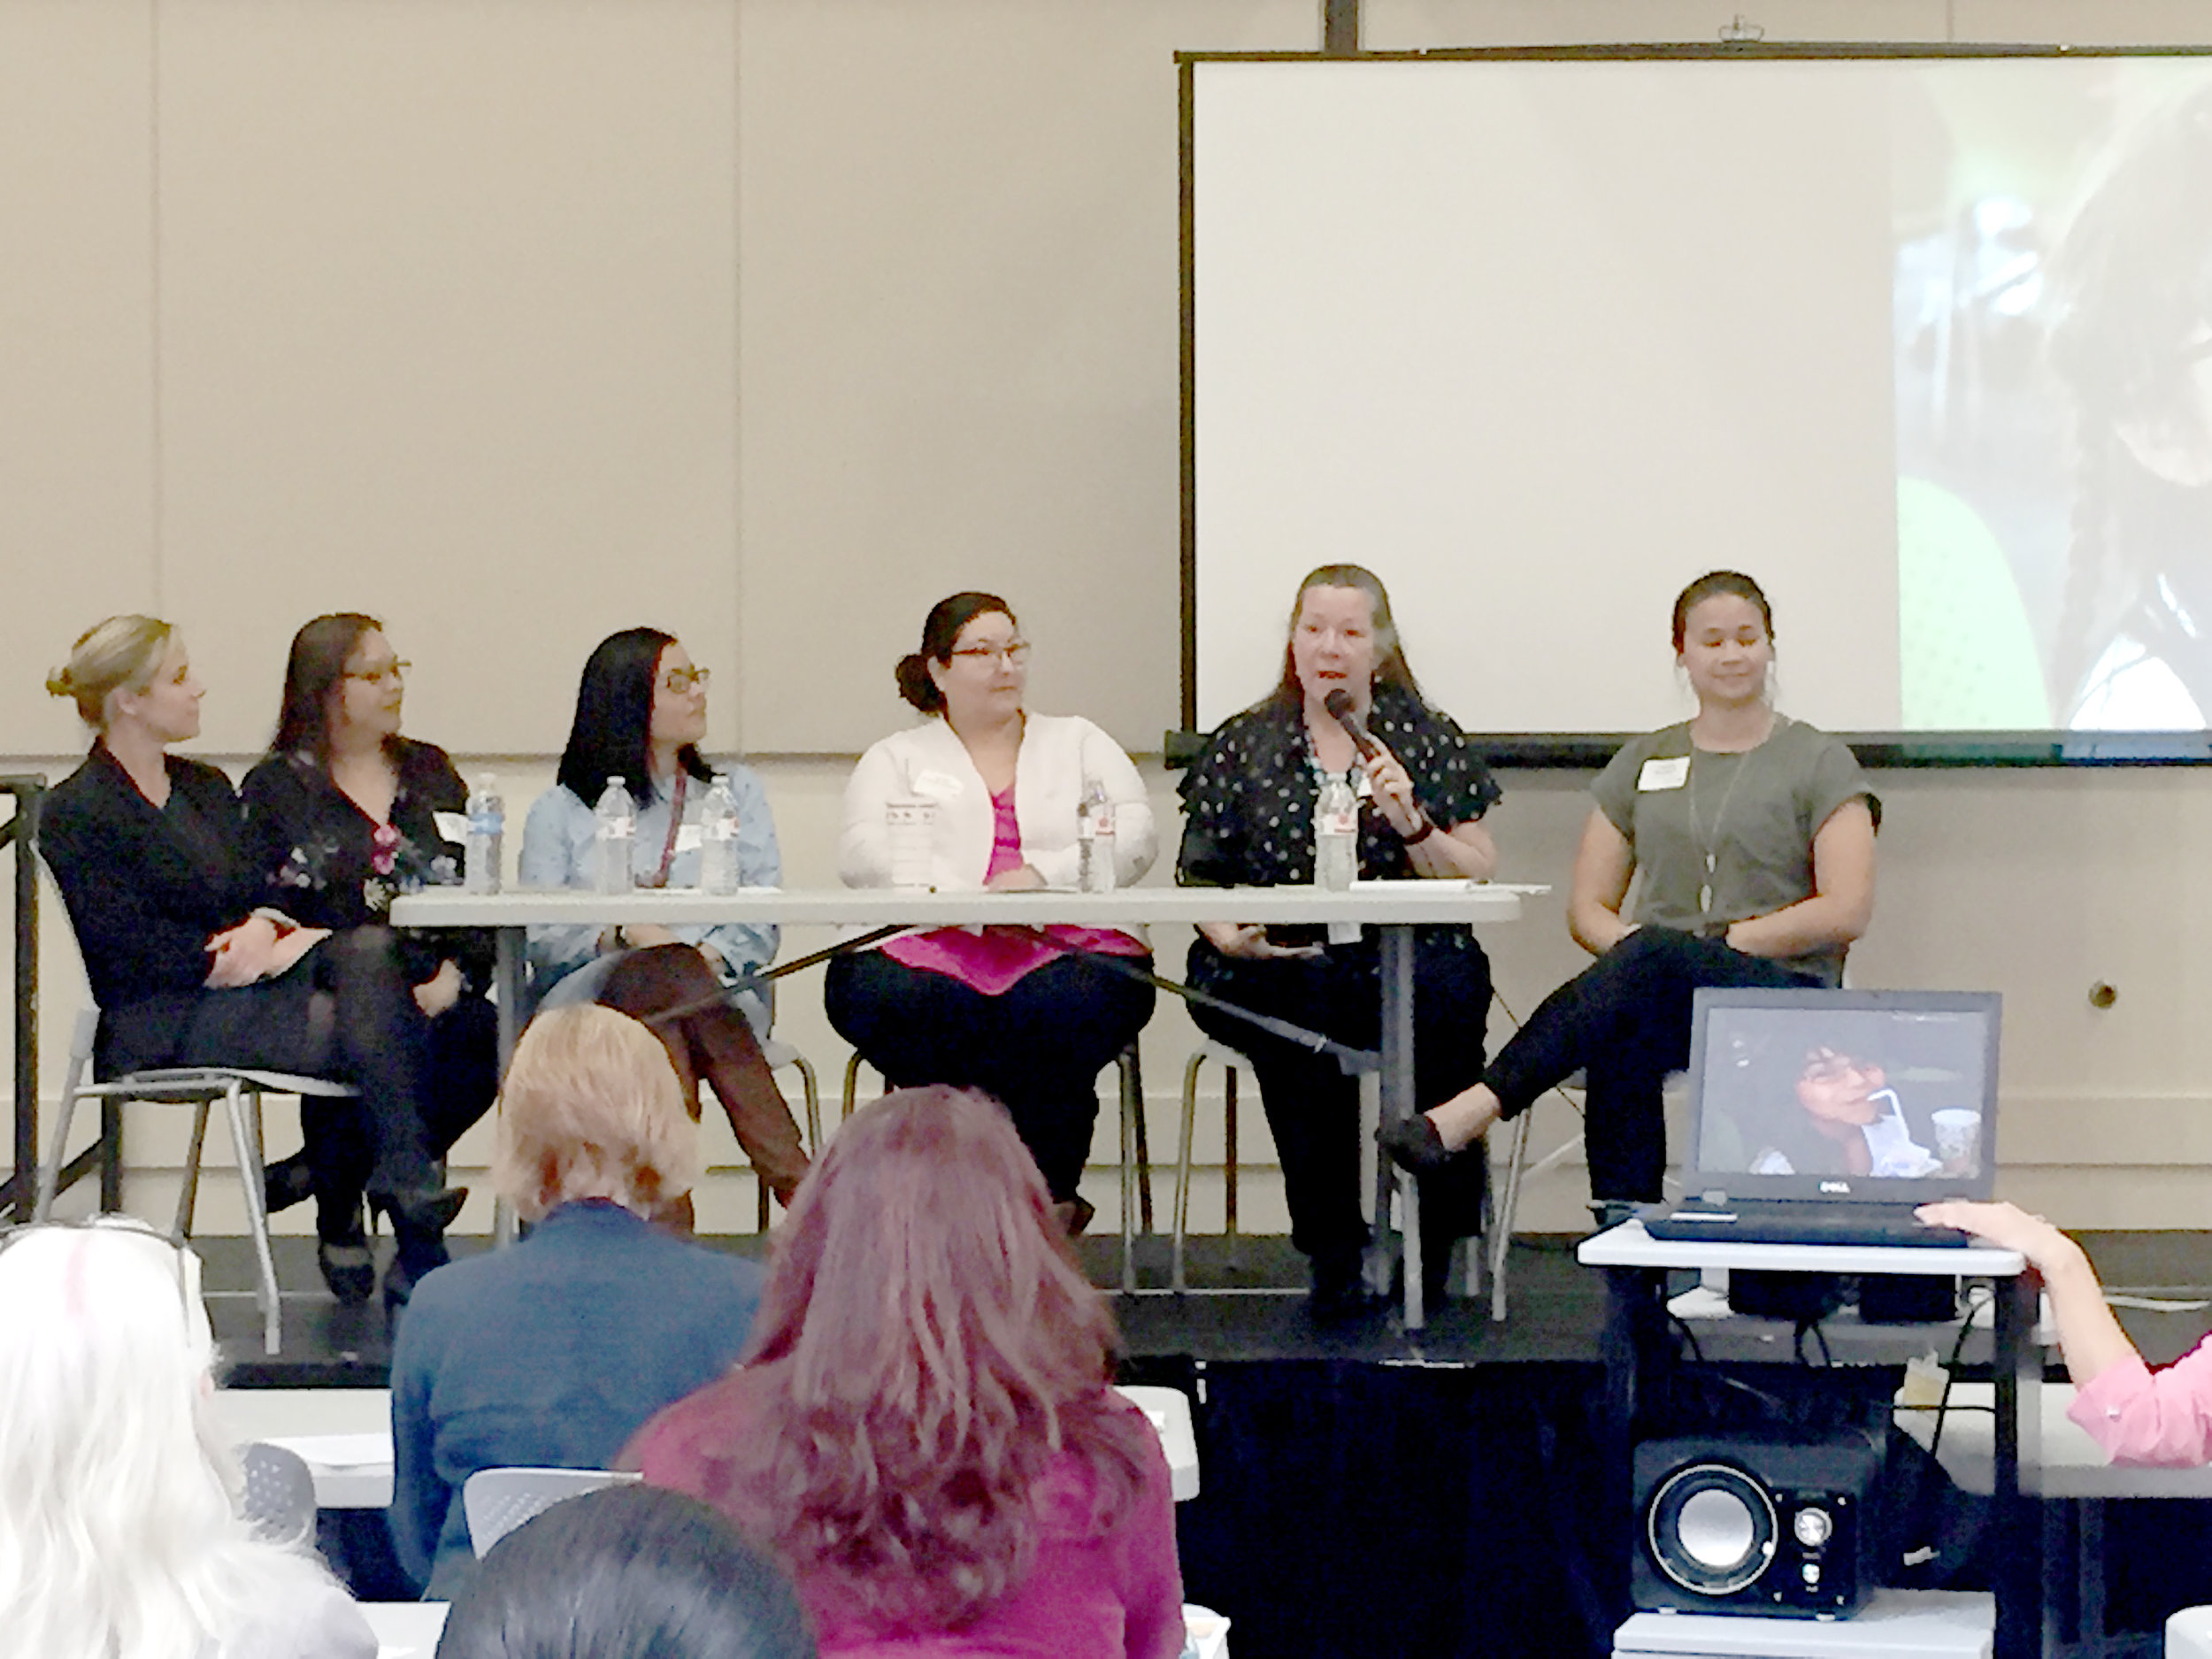 North Panel: (Left to Right) Naomi Shadwell, Brenda Monzon, Orquidia Contreras, Susan Salinas-Ramos, Lisa Ferneau-Haynes, Maddy Moritsch